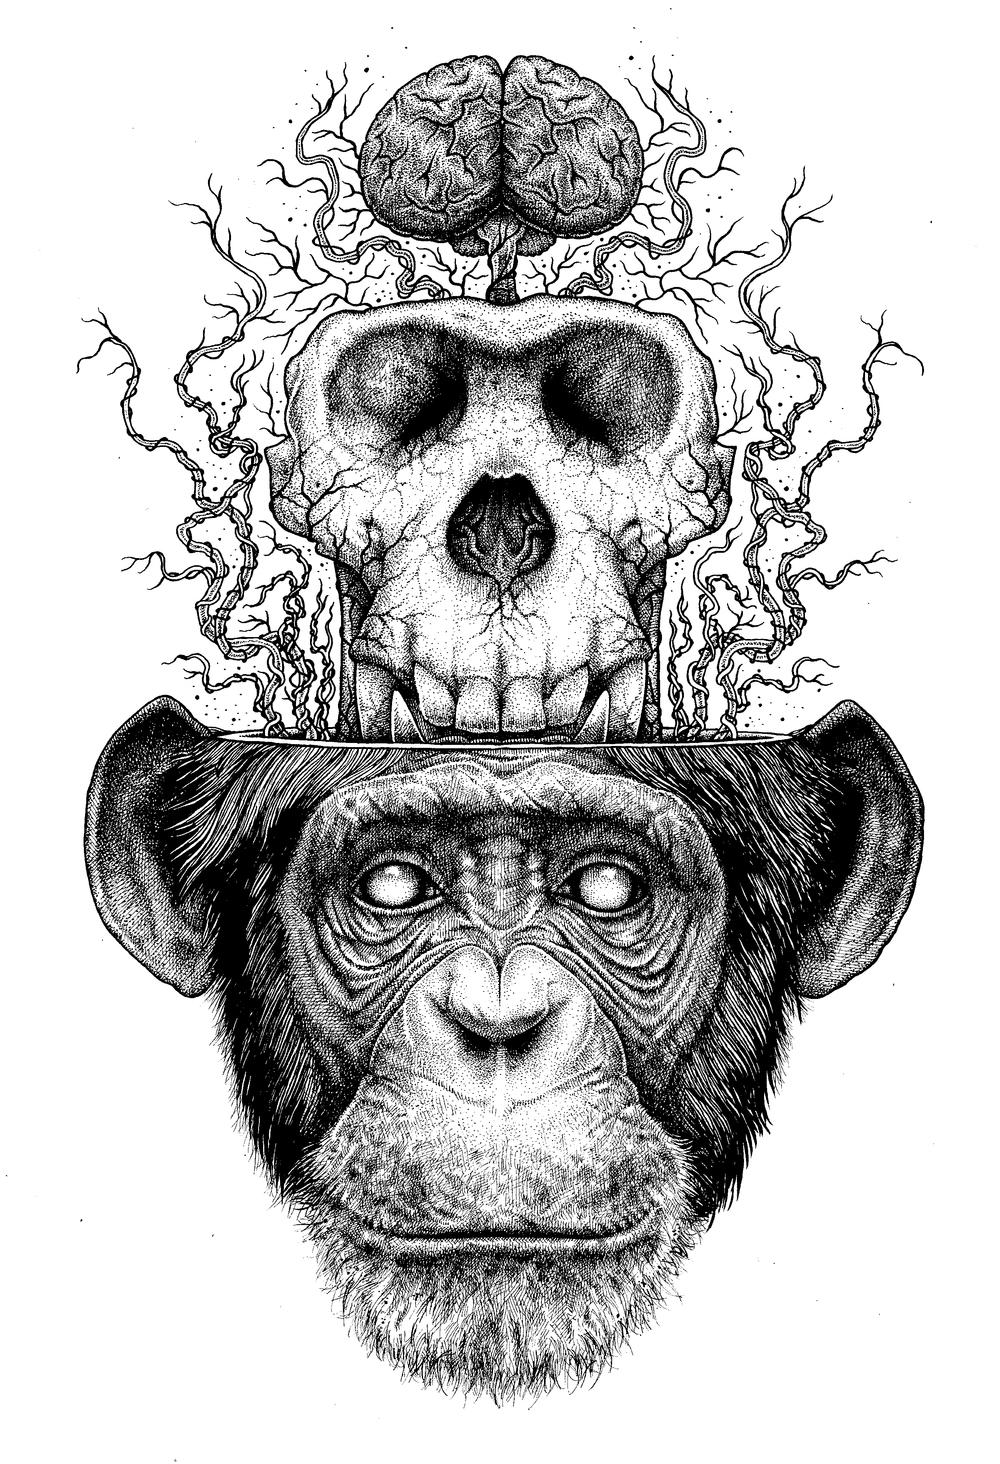 Drawn skeleton monkey Monkey jackson Pat on Search